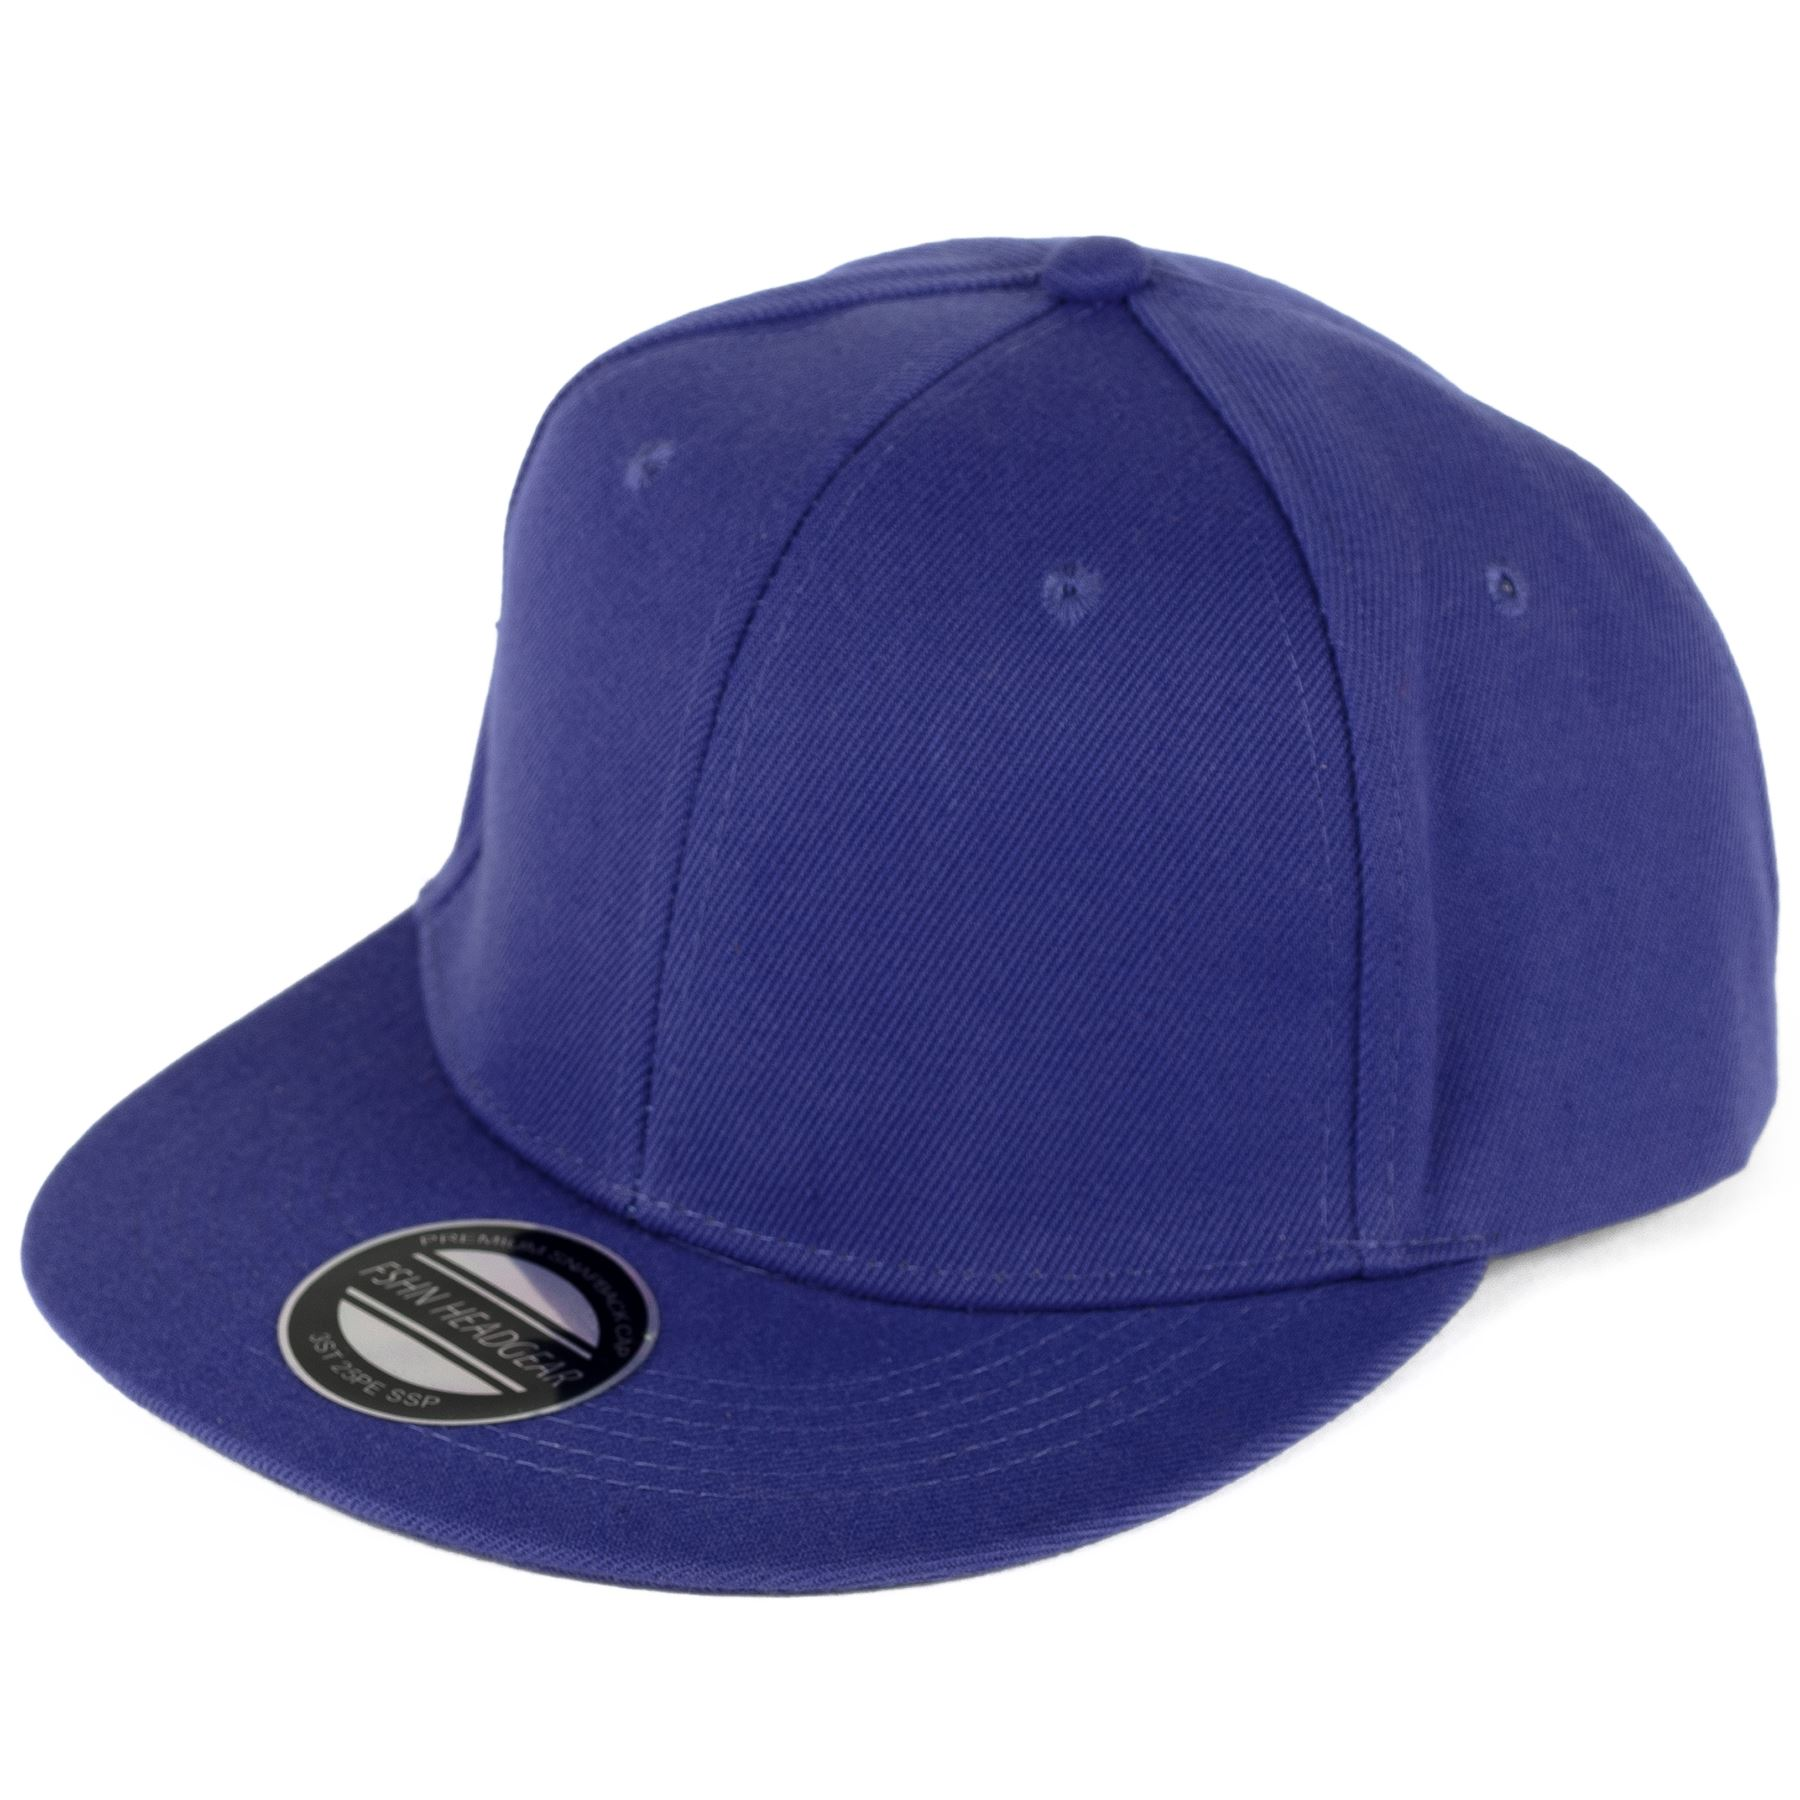 Hommes-Femmes-Casquette-de-Baseball-Snapback-Chapeau